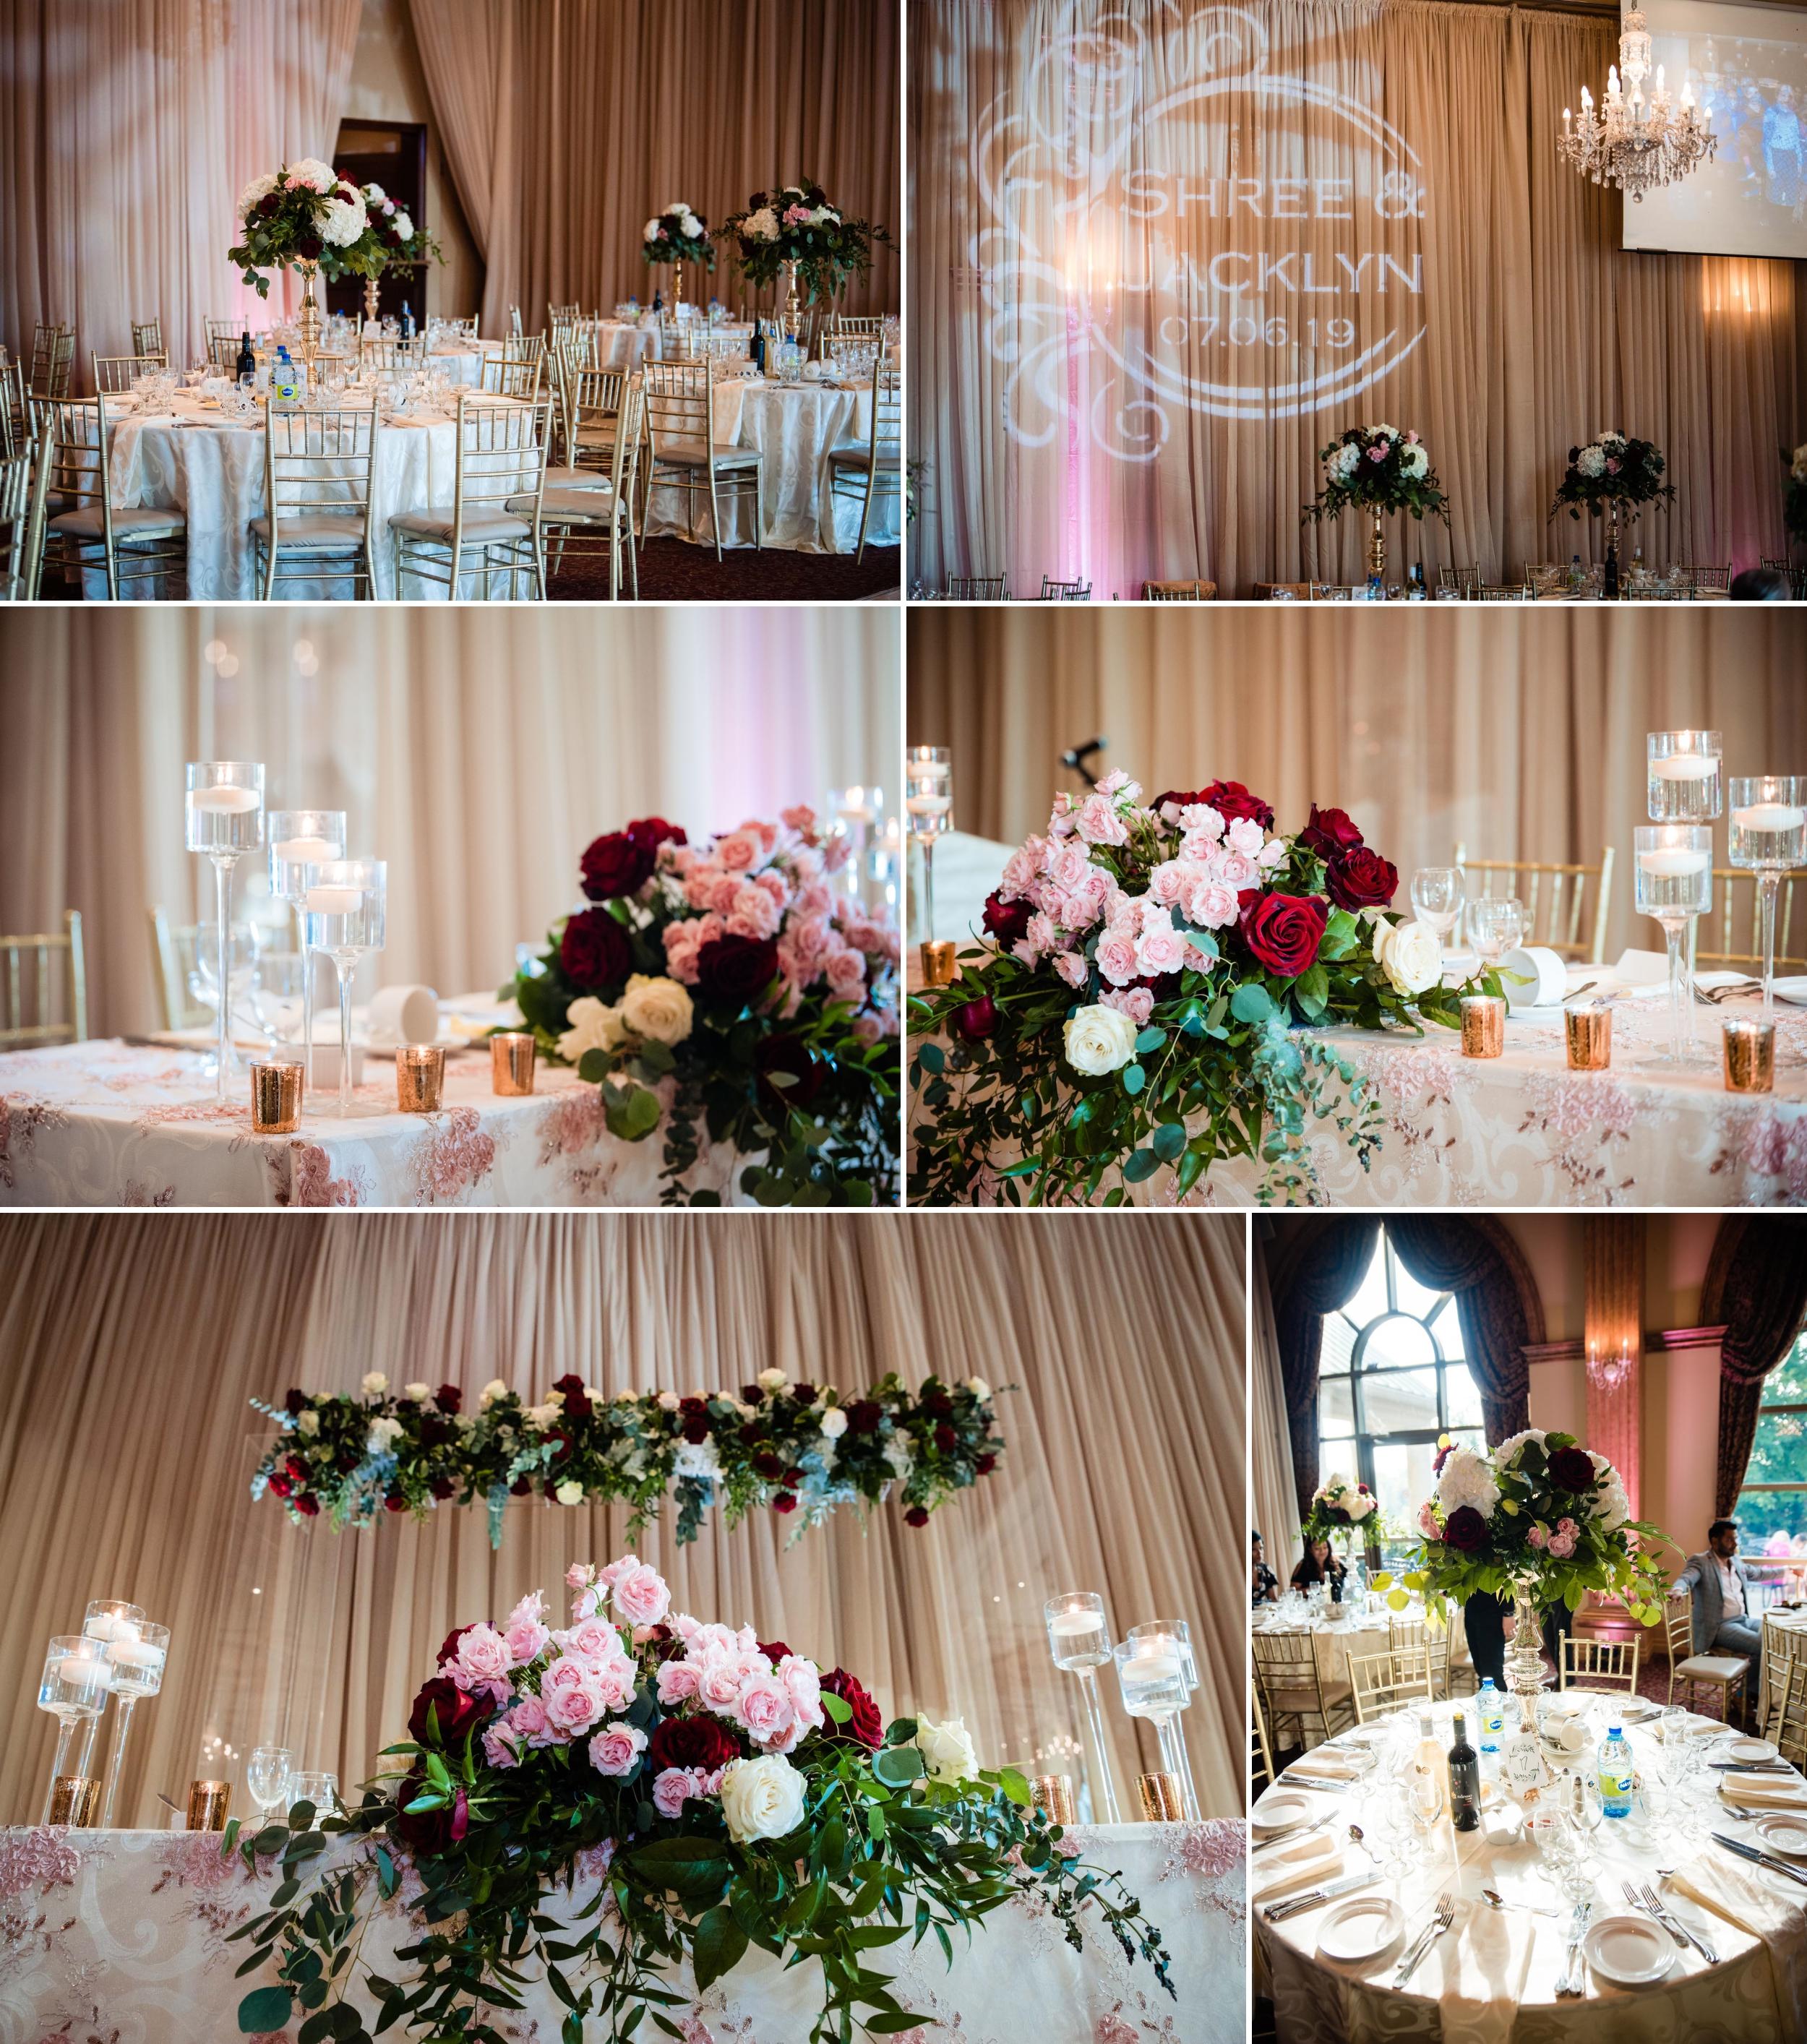 luxury-indian-wedding-royal-ambassador-toronto (3).jpg